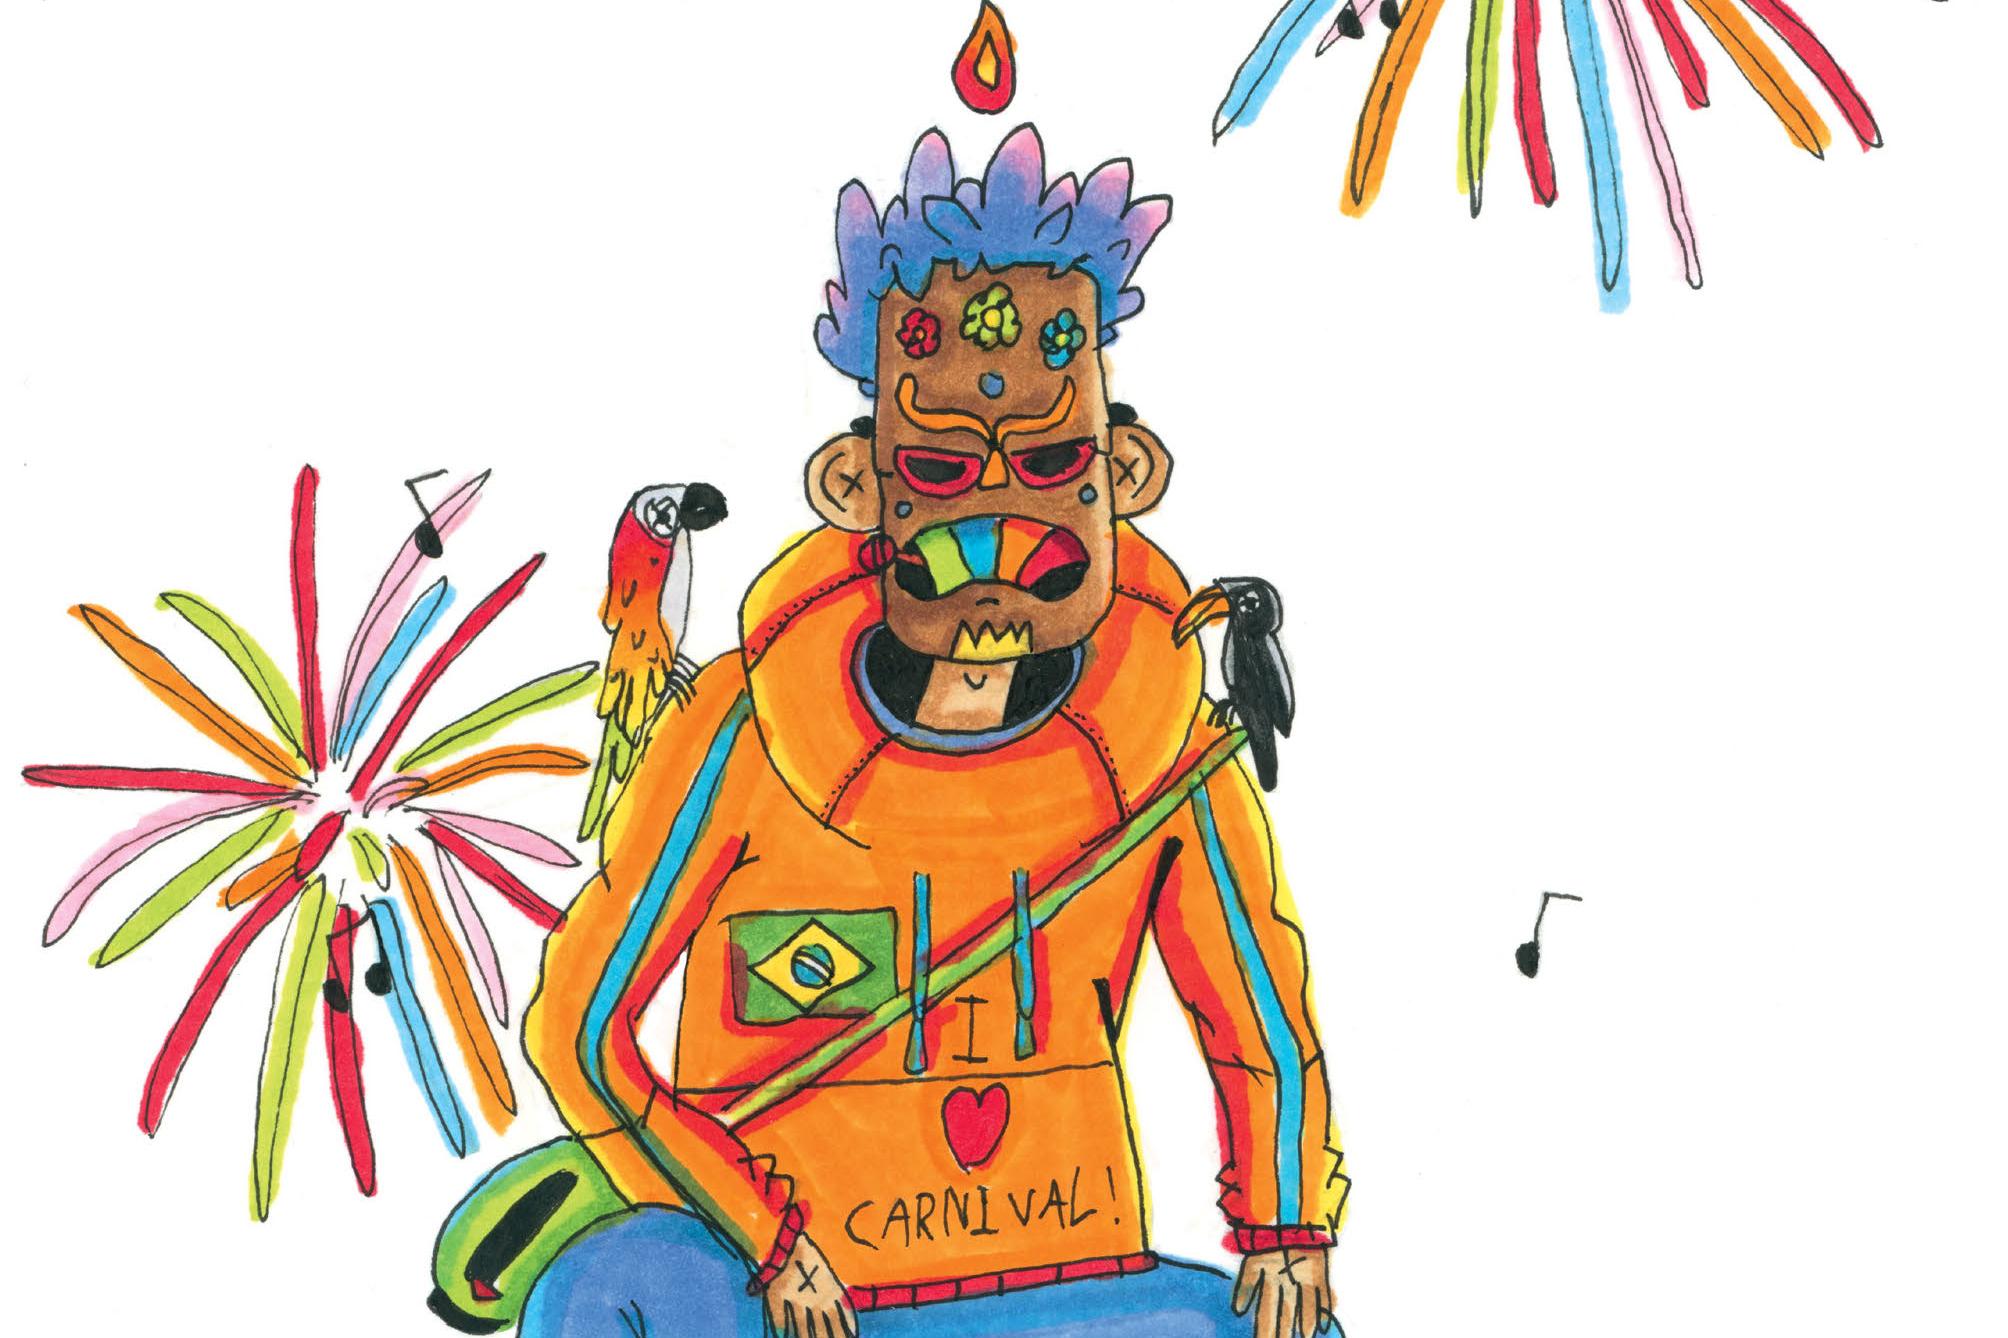 O carnaval do Rio